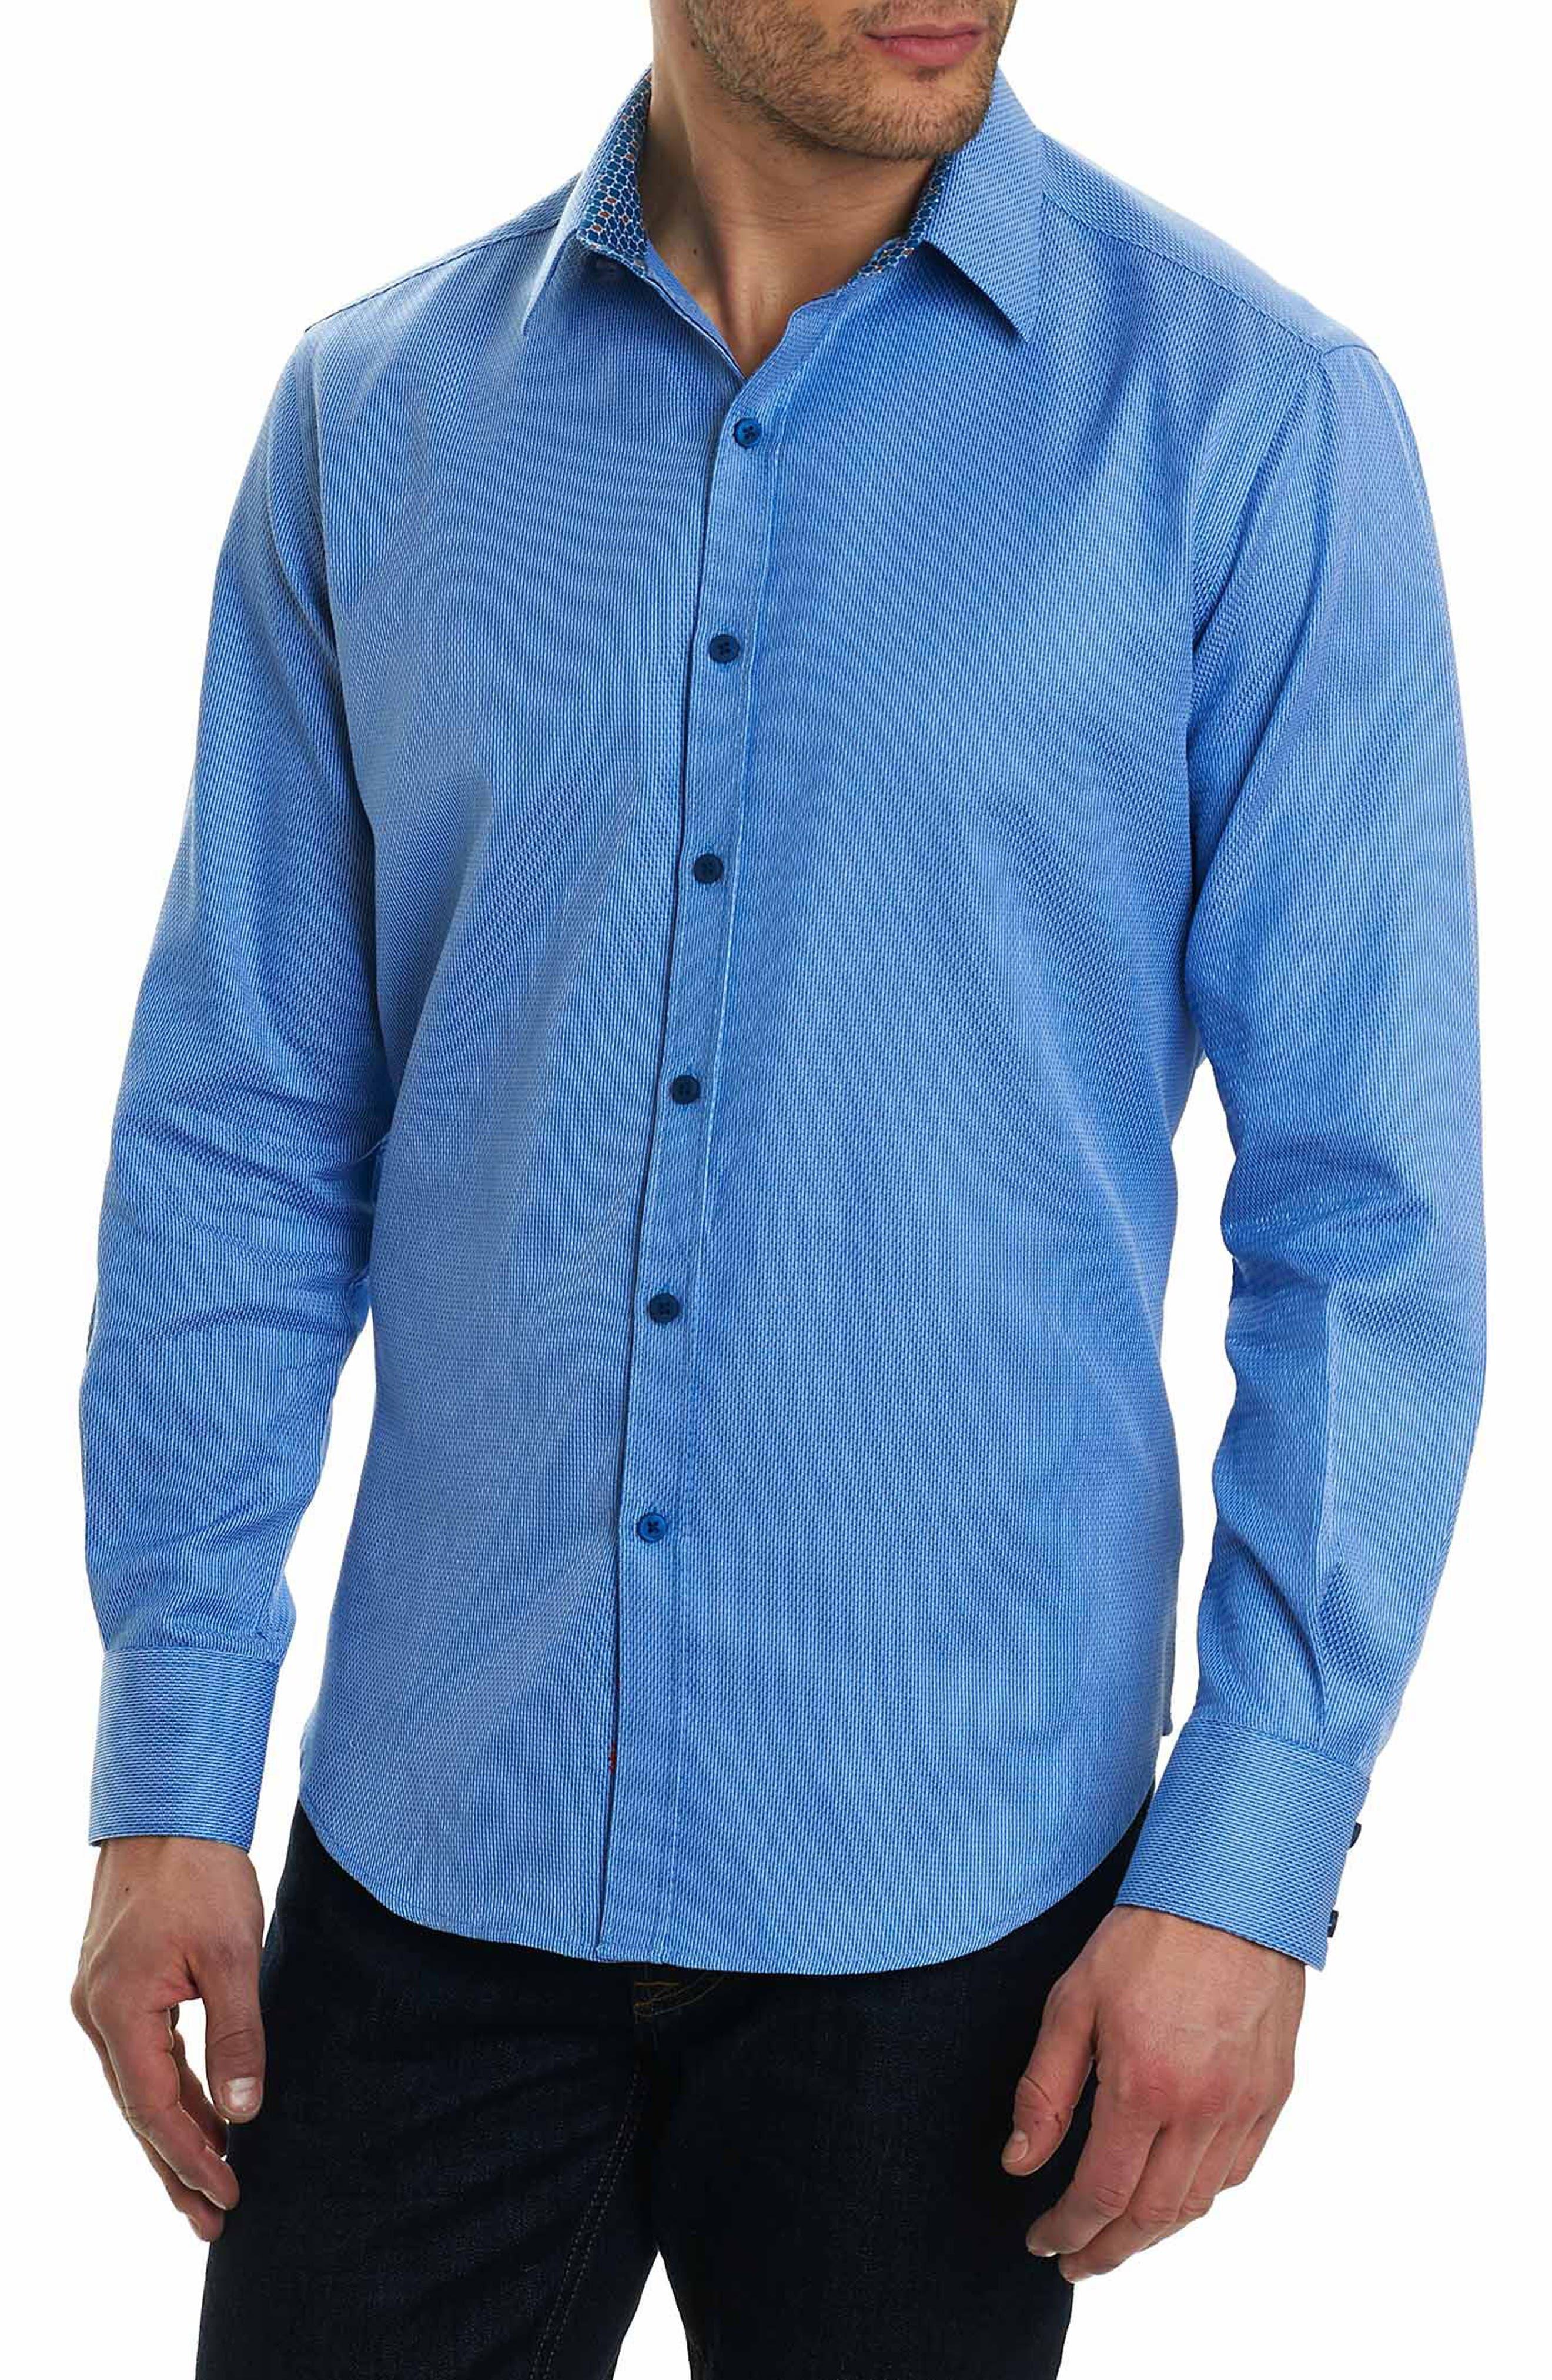 Jobson Classic Fit Sport Shirt,                             Main thumbnail 1, color,                             400